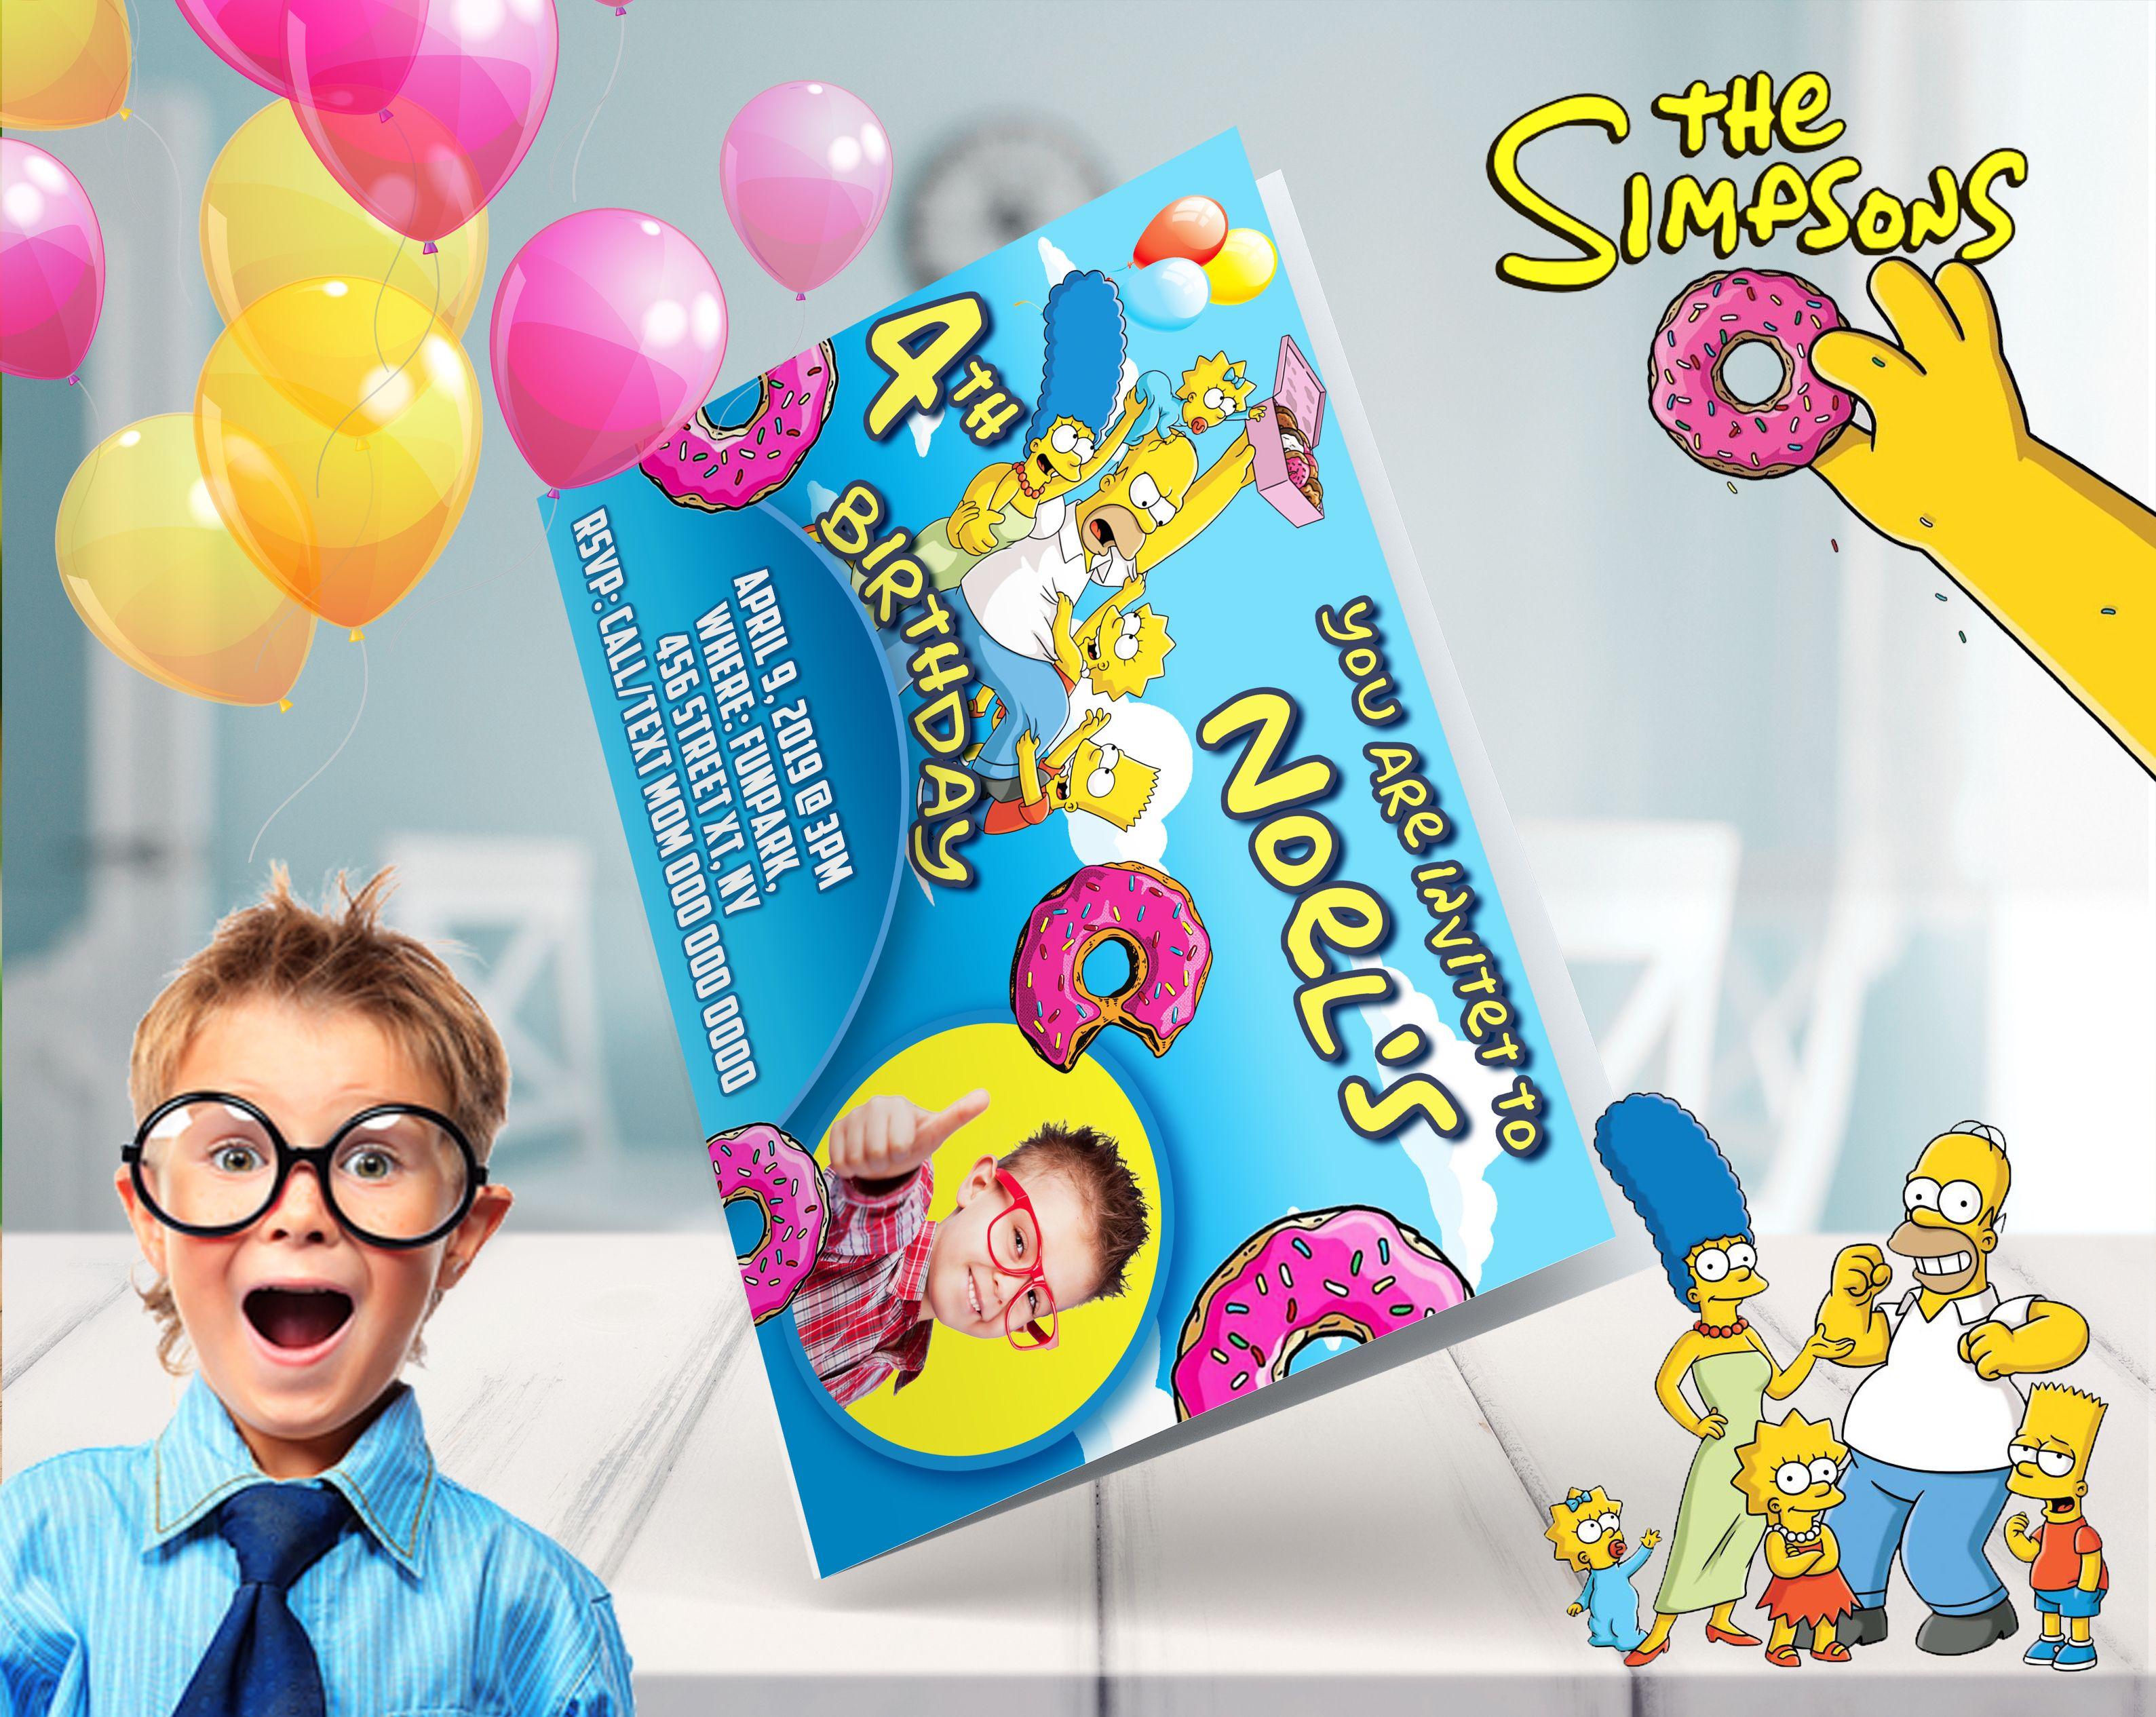 Cartoon Birthday Invitation Card Exaple Movie Cartoon For Kids Fun Birthday Invitation Templates Birthday Invitation Card Template Birthday Invitations